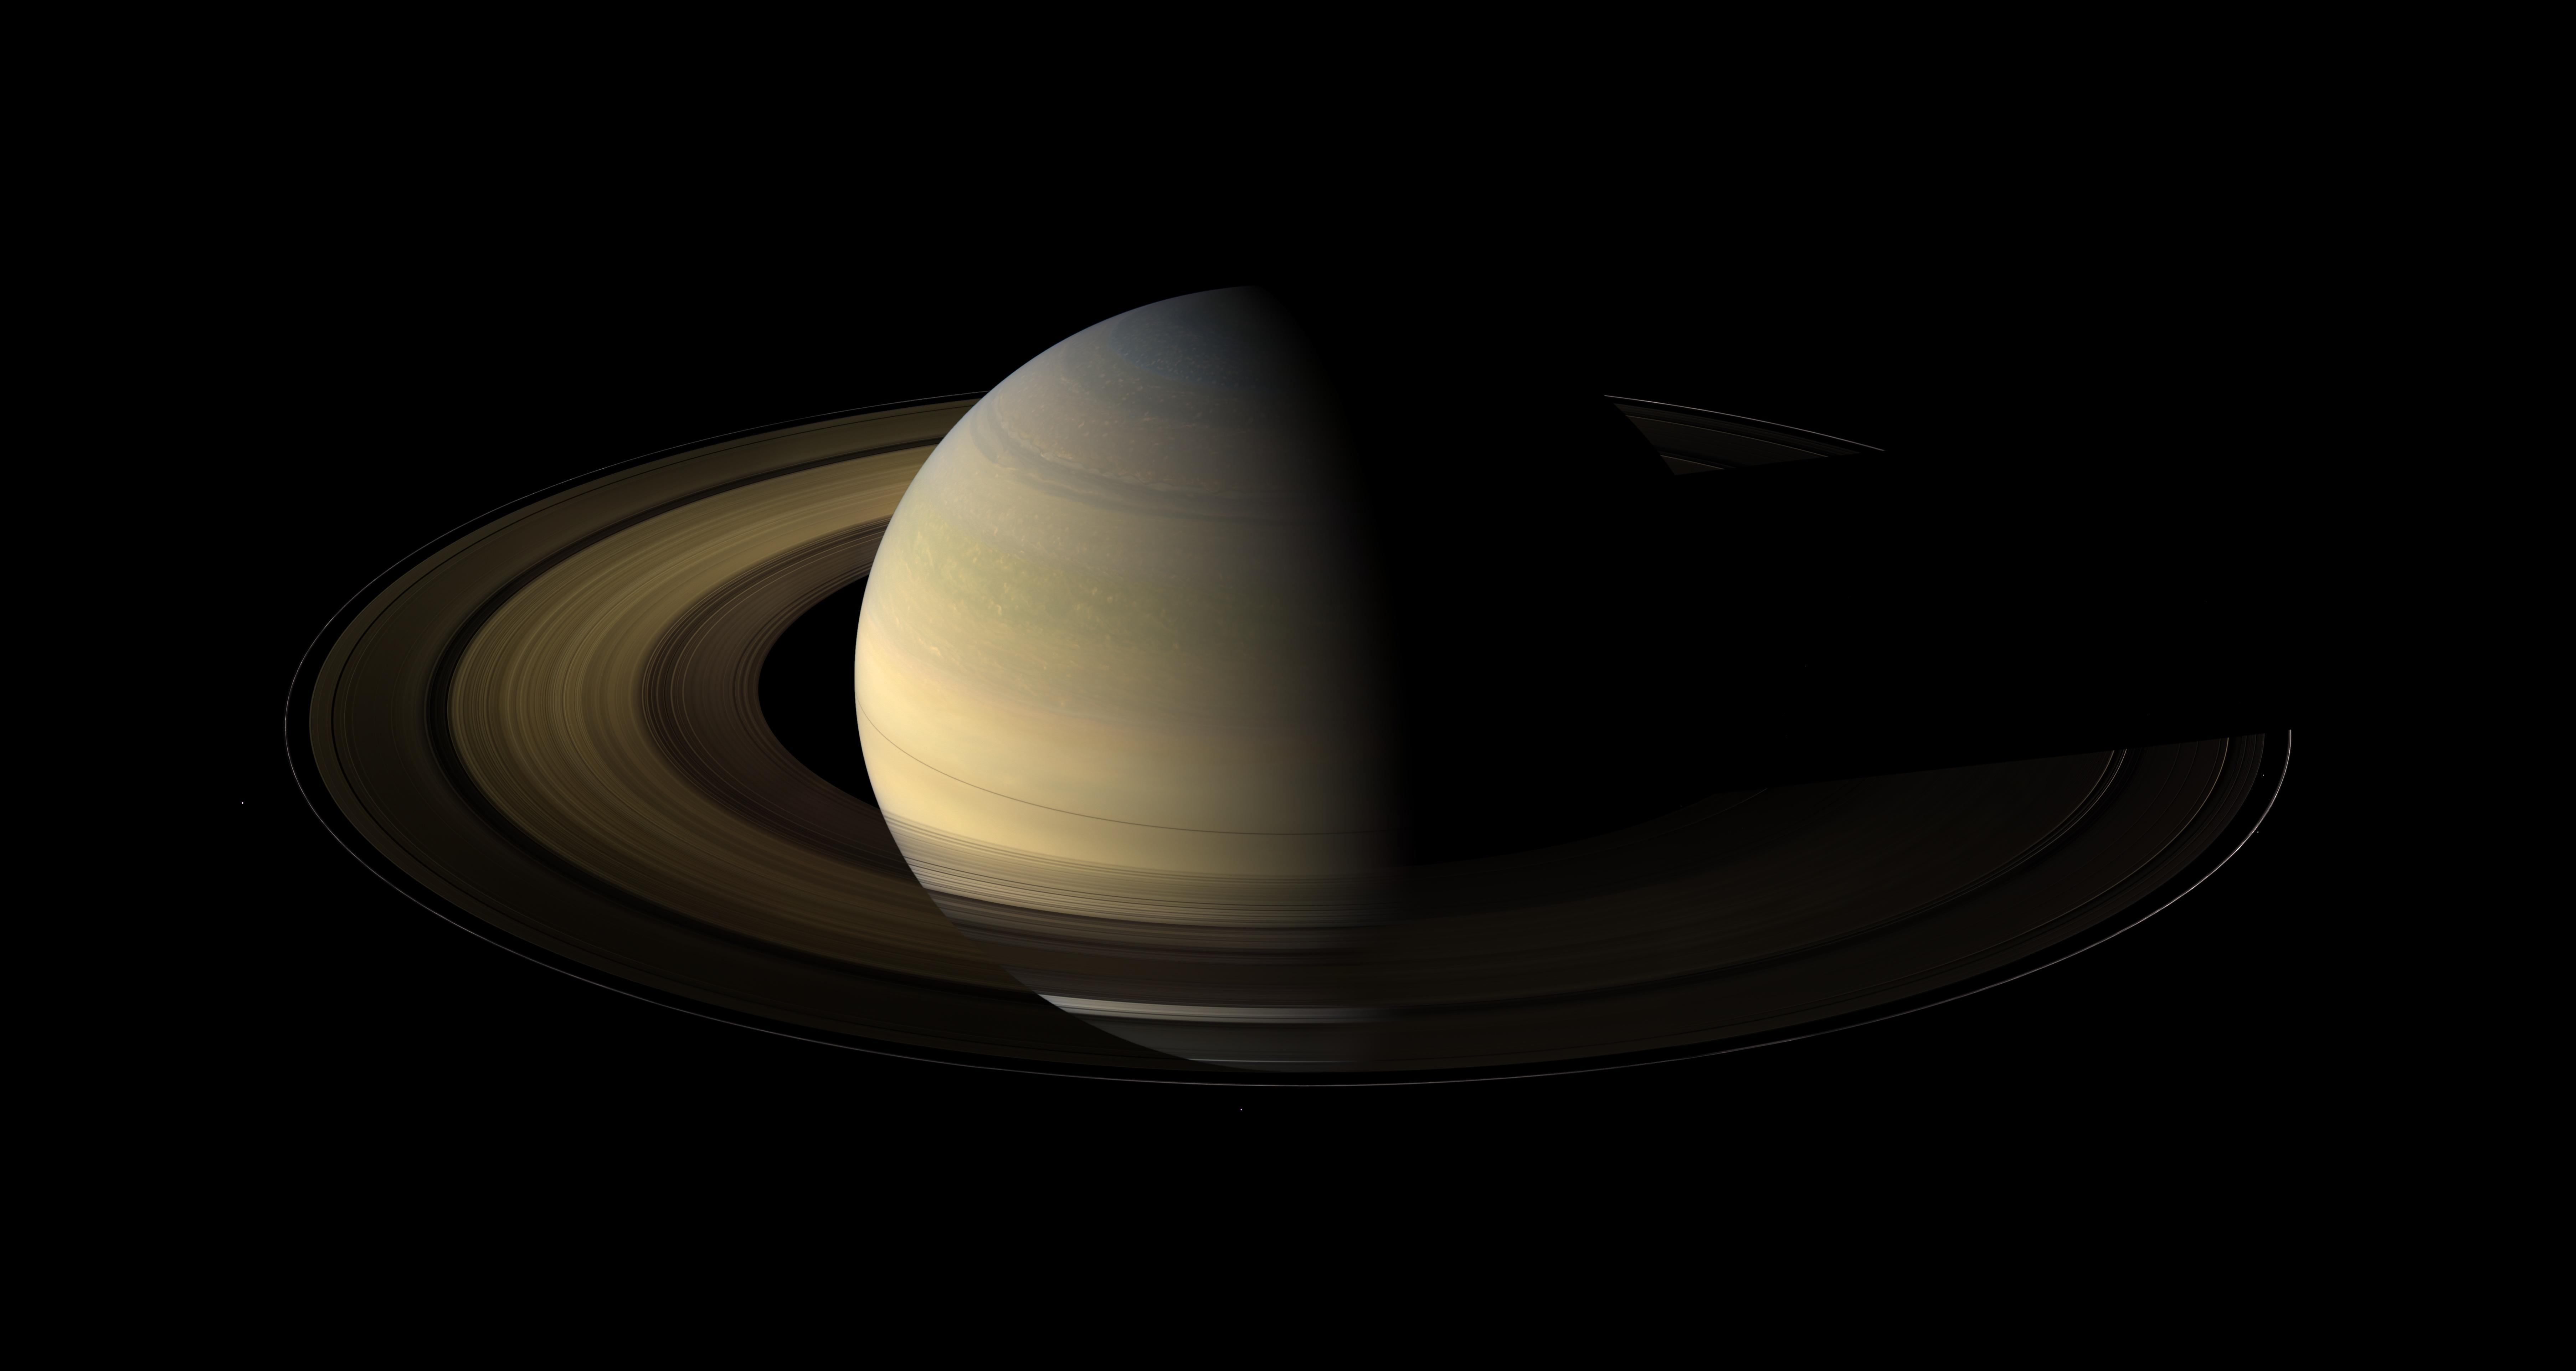 Pianeti sistema solare